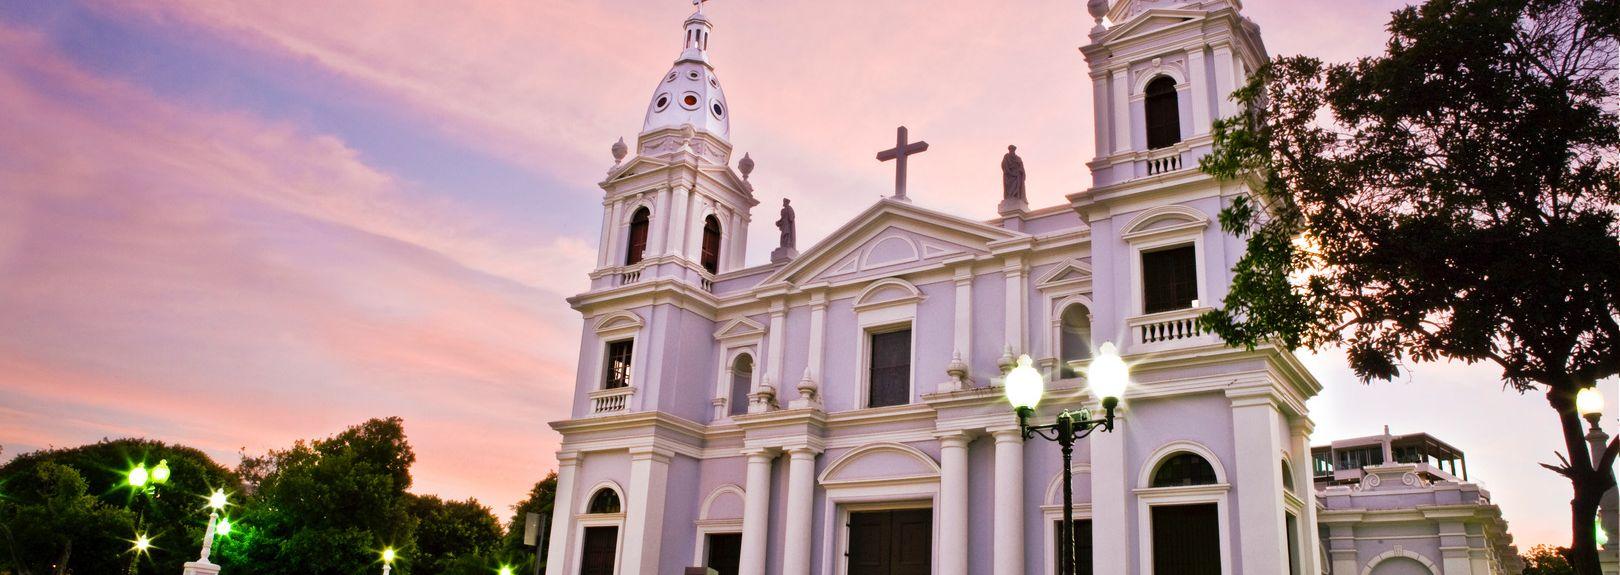 La Guancha, Ponce, Porto Rico